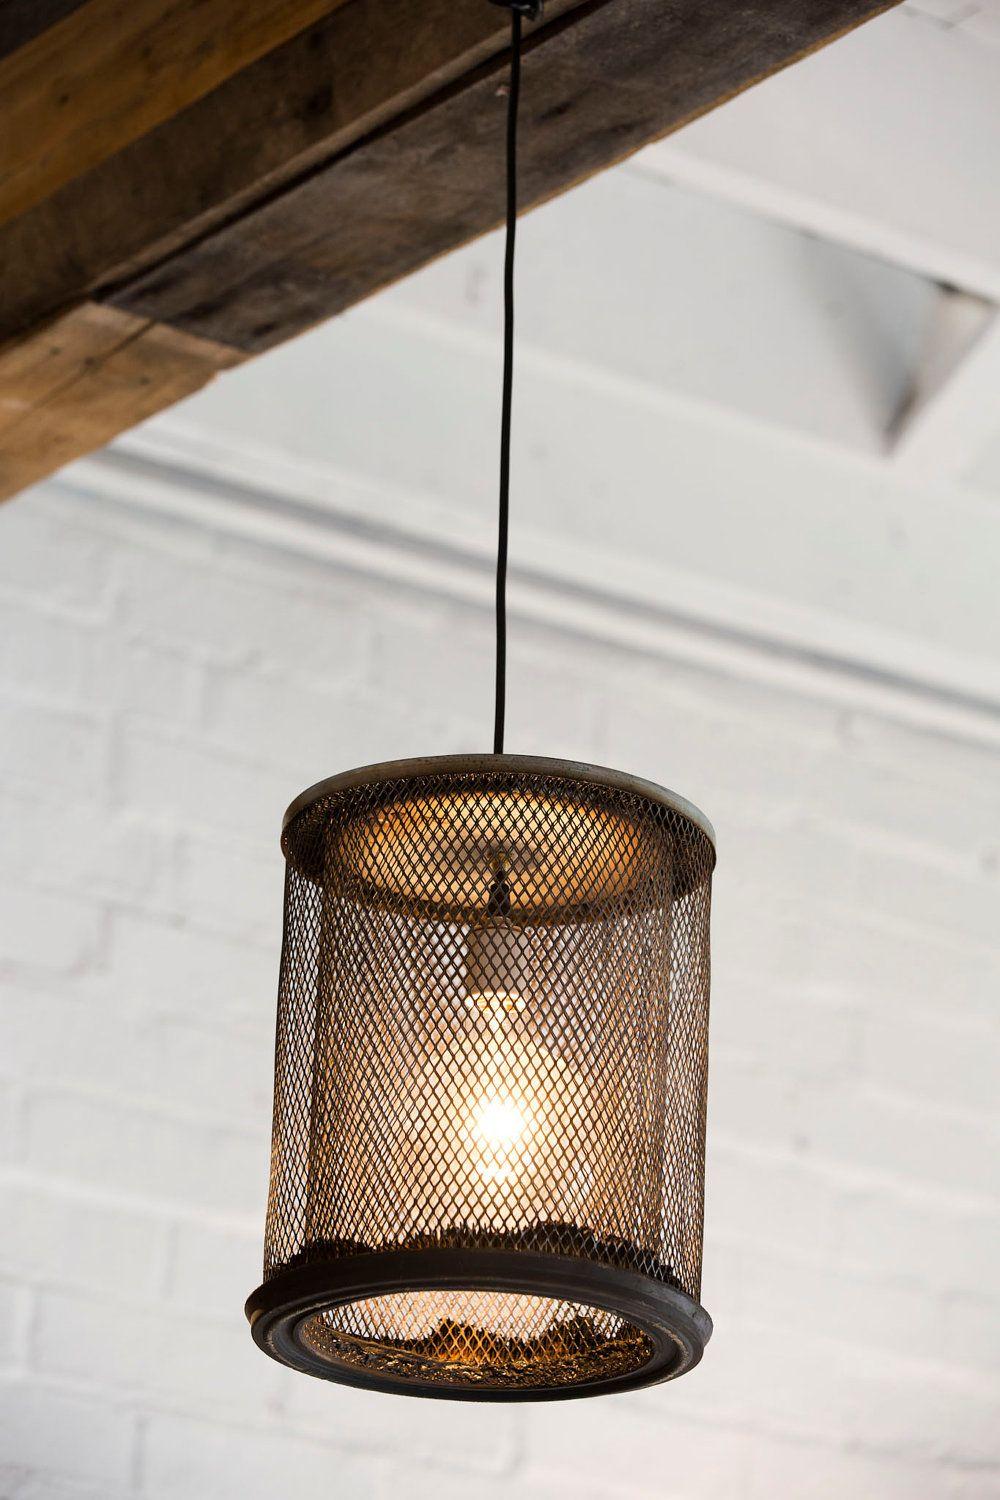 Custom Lights For Jill | Reciclado | Lighting, Custom throughout Jill 4-Light Drum Chandeliers (Image 10 of 30)